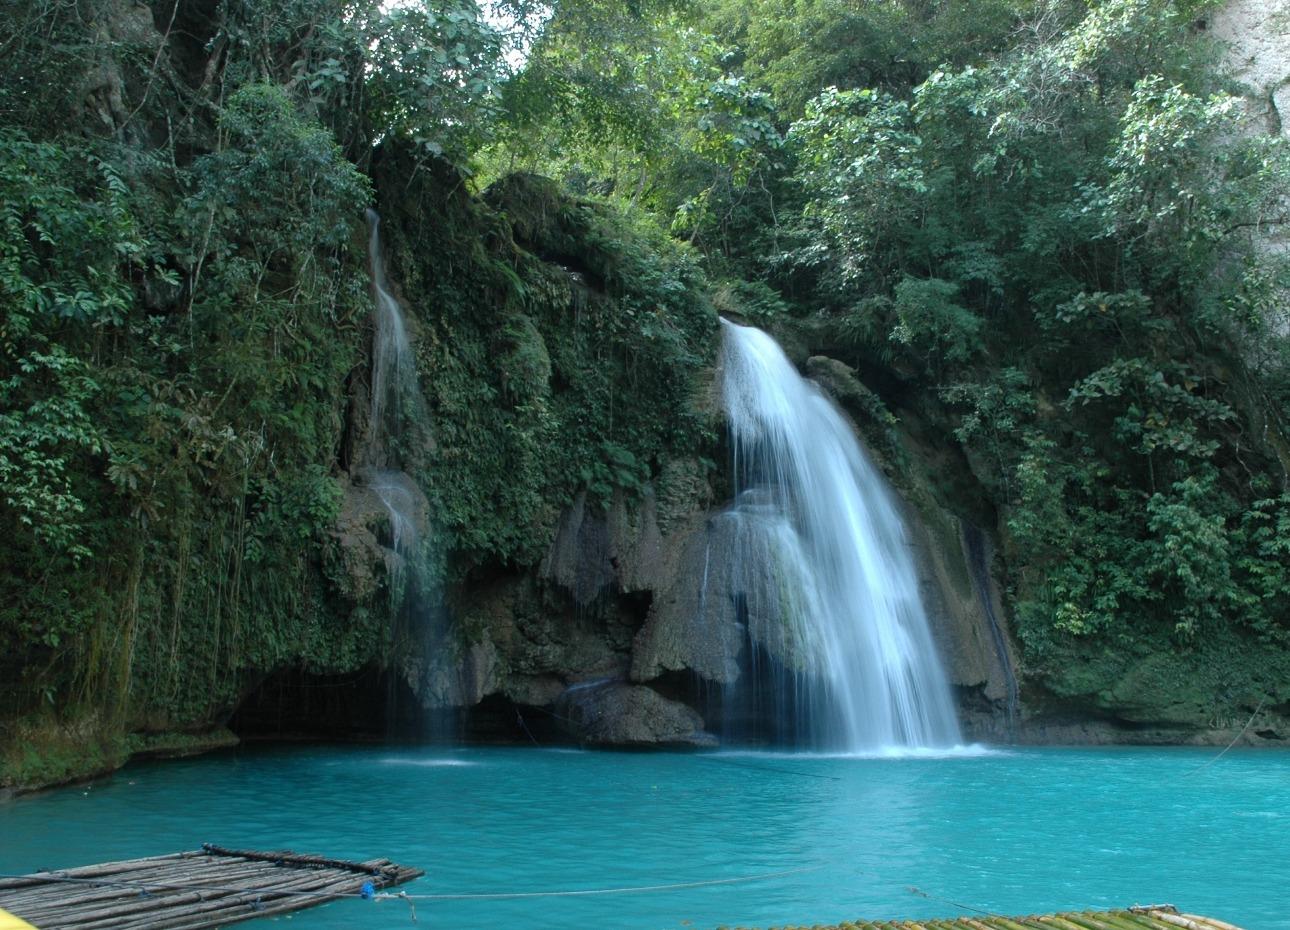 Philippines, Moalboal Magic Island, Dive Resort, Kawasan Falls, image,